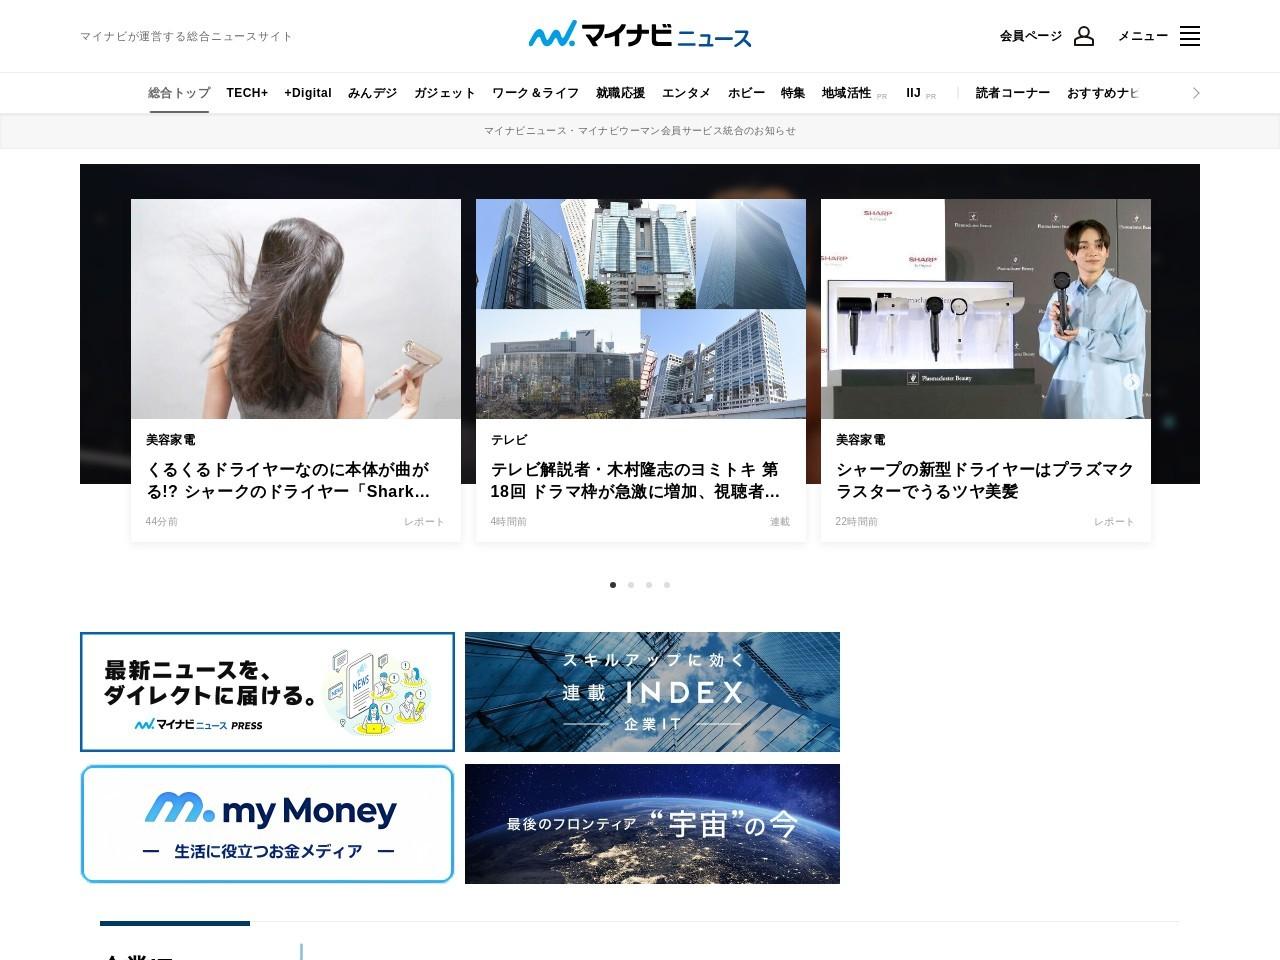 https://news.mynavi.jp/article/20180619-yamahascskinterop/